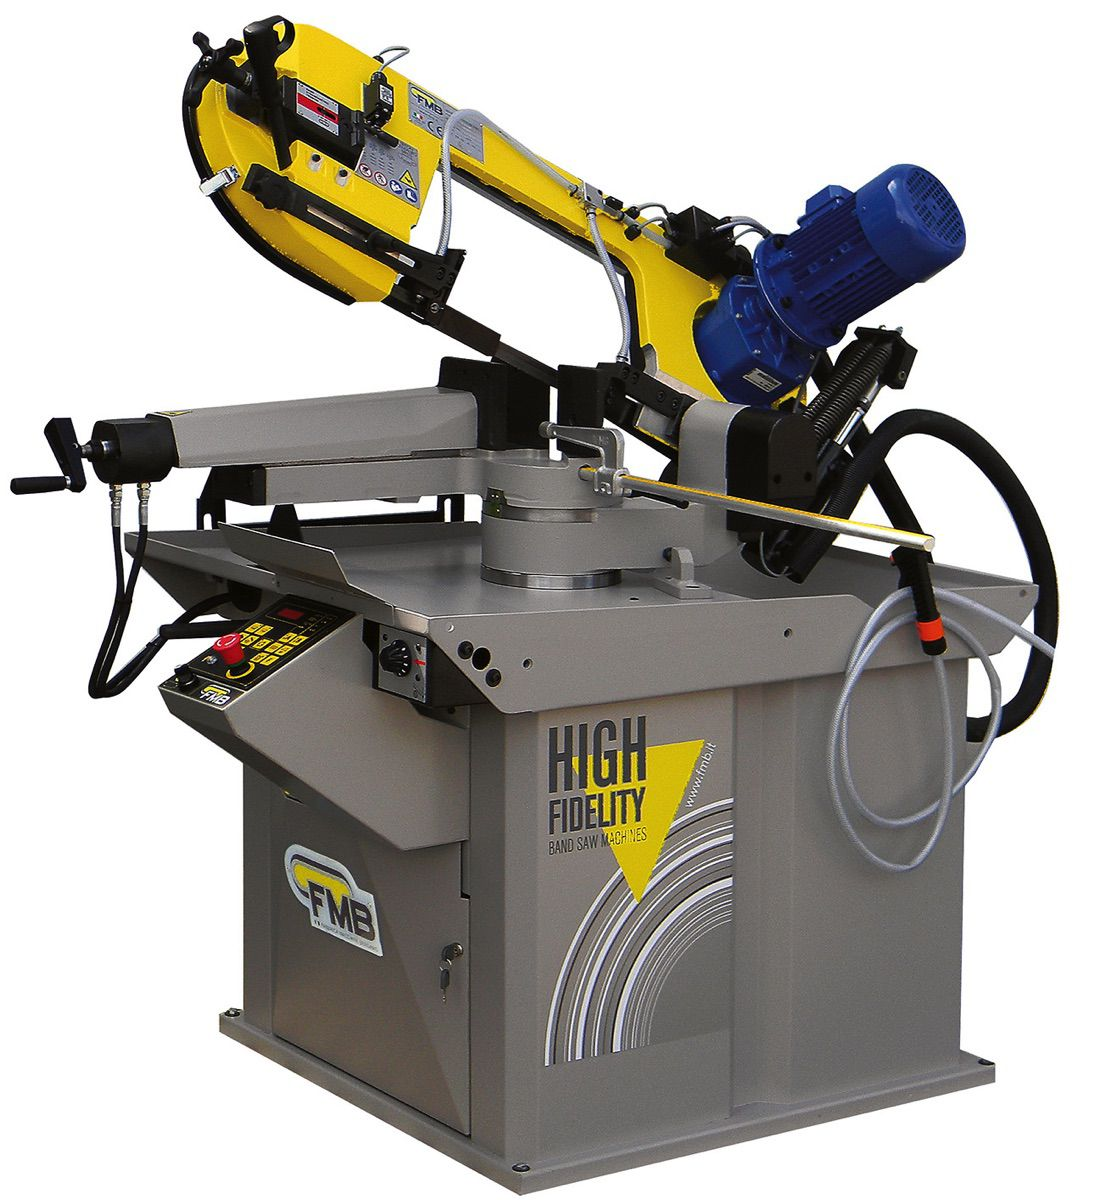 fmb sirius half automatische lintzaagmachine